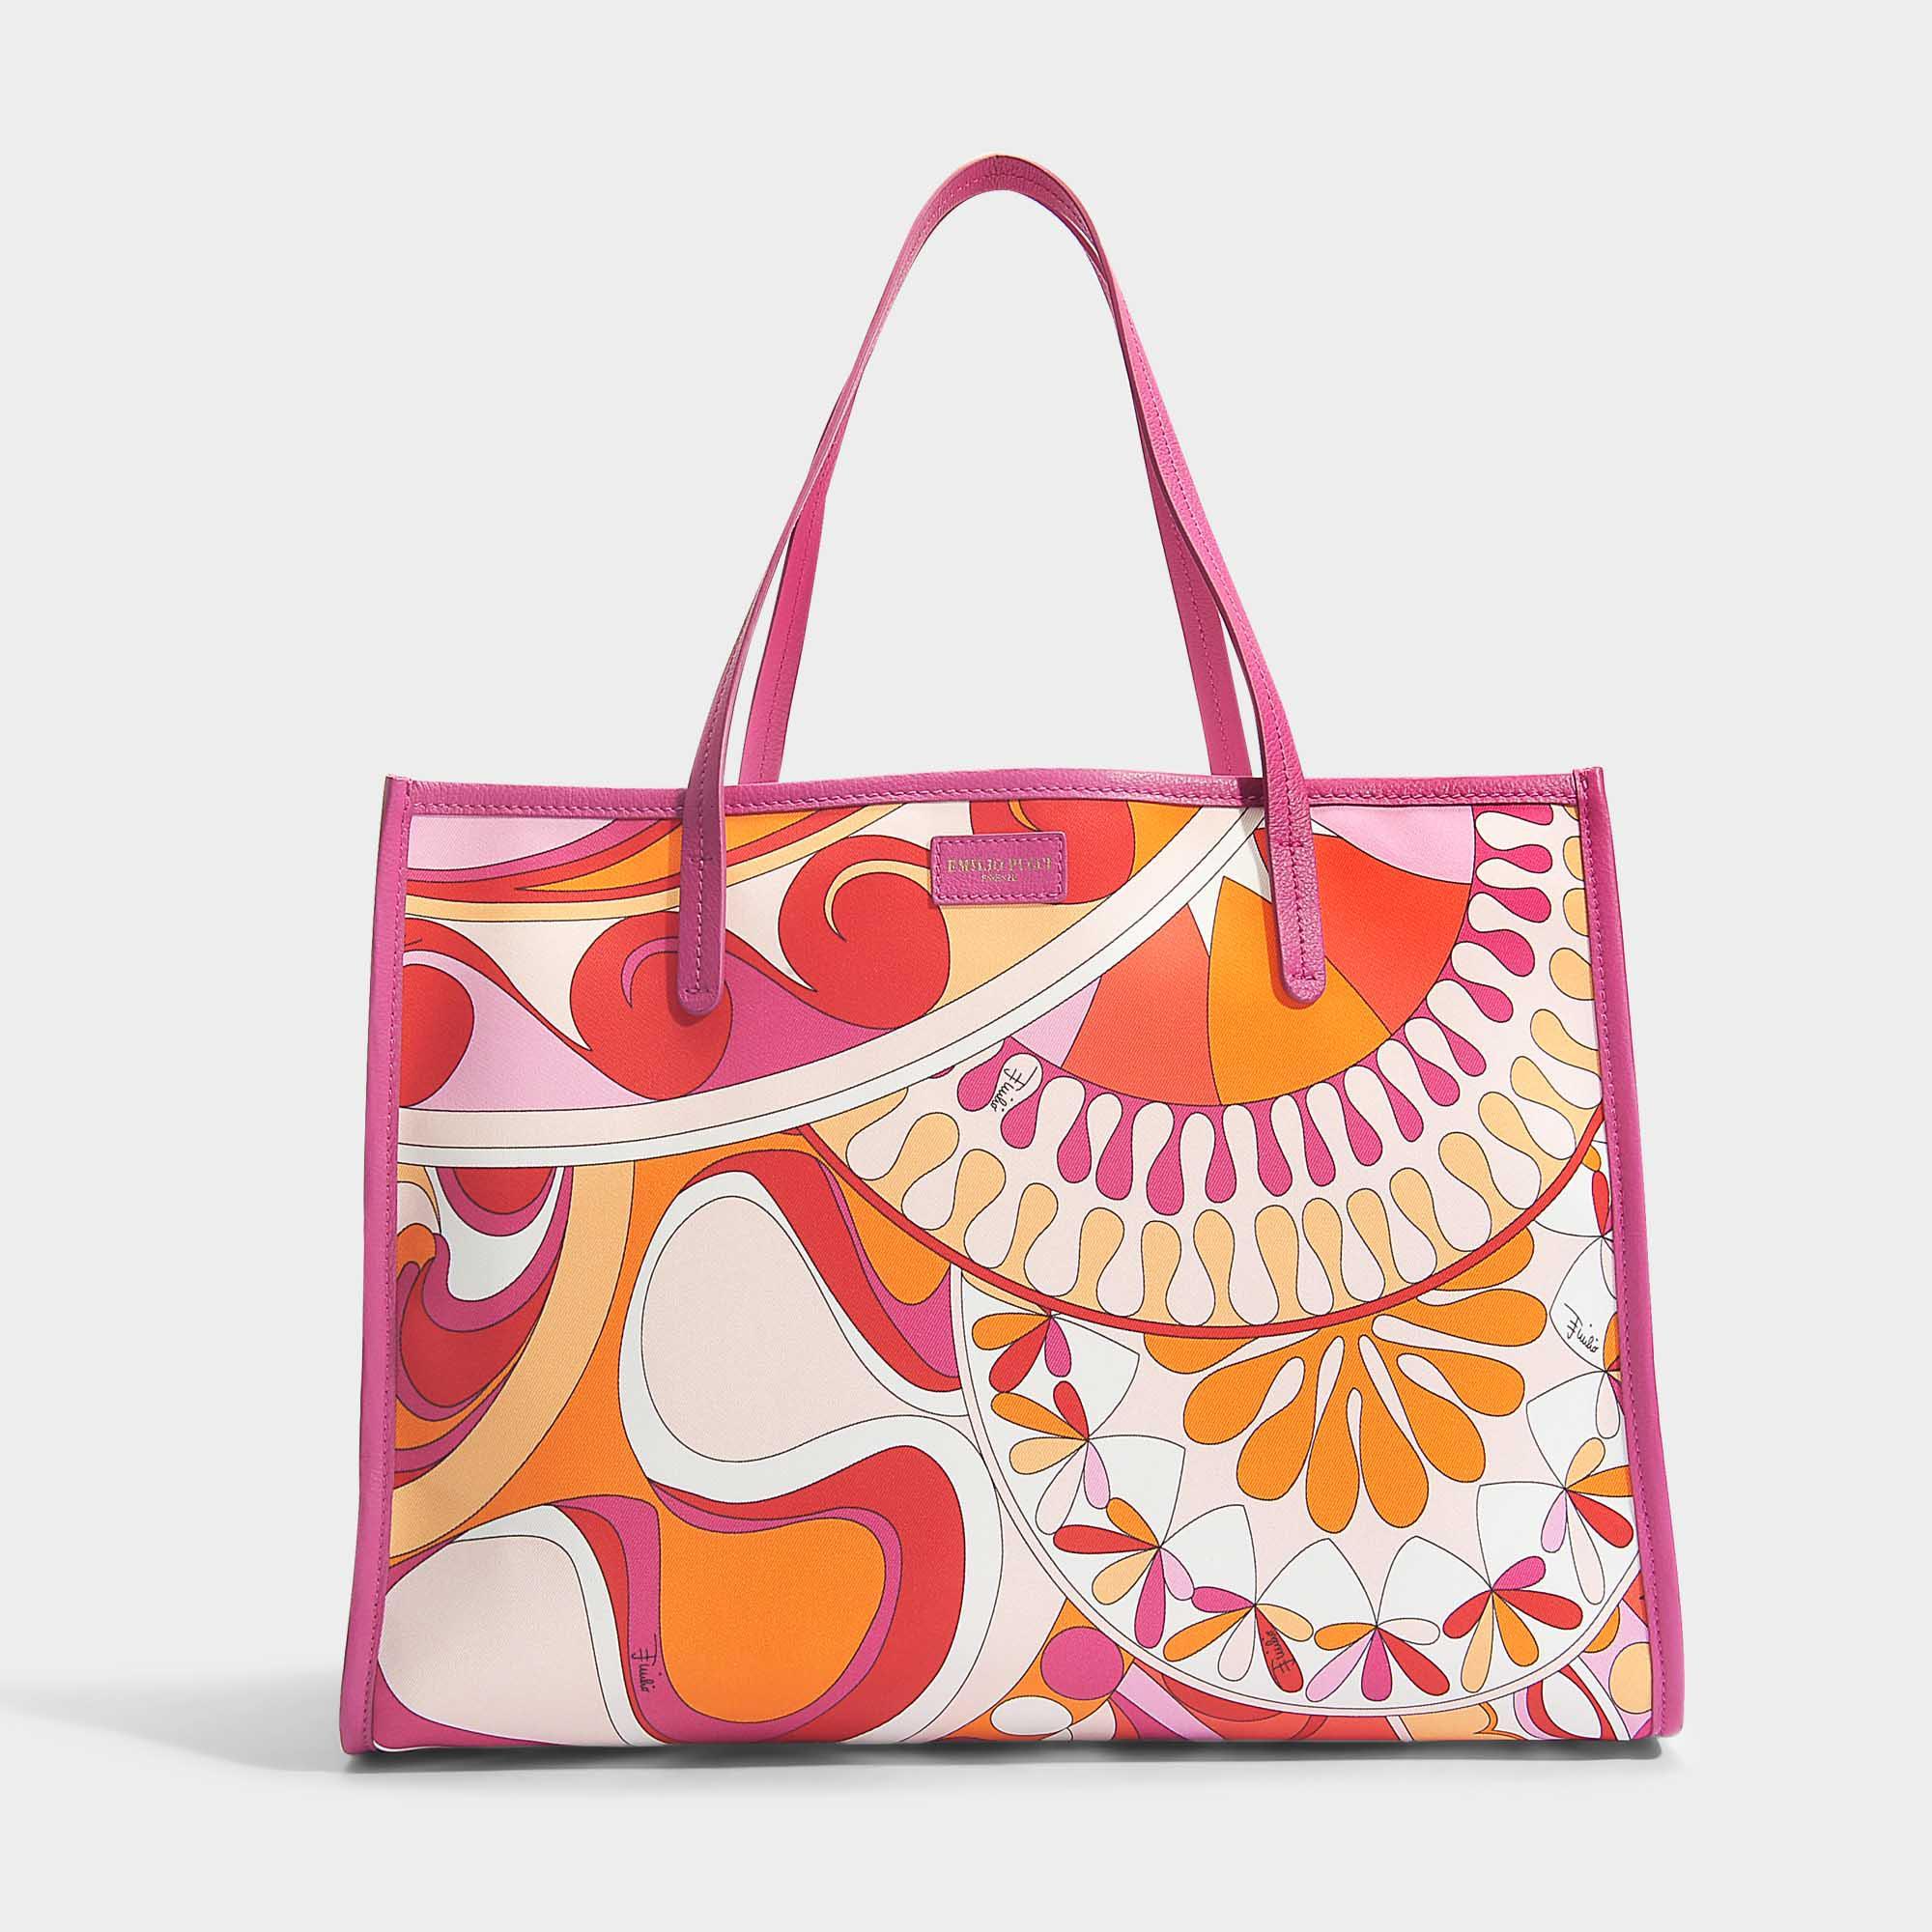 Capri Tote Bag in Orange Printed Nylon Emilio Pucci S4RNJt5rq2